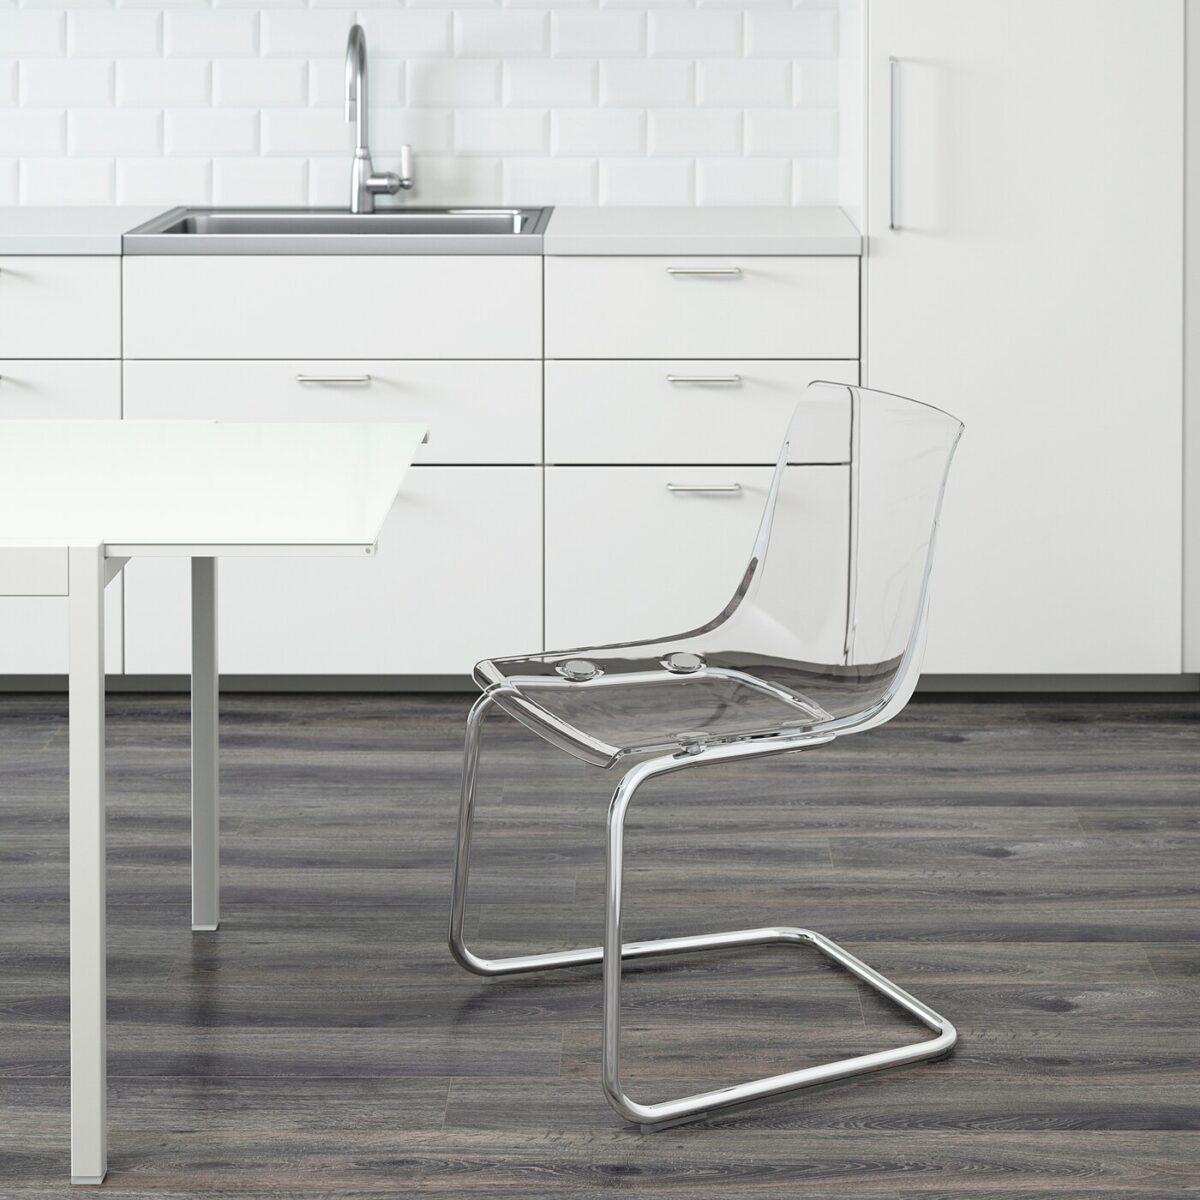 sedia-moderna-acrilico-trasparente